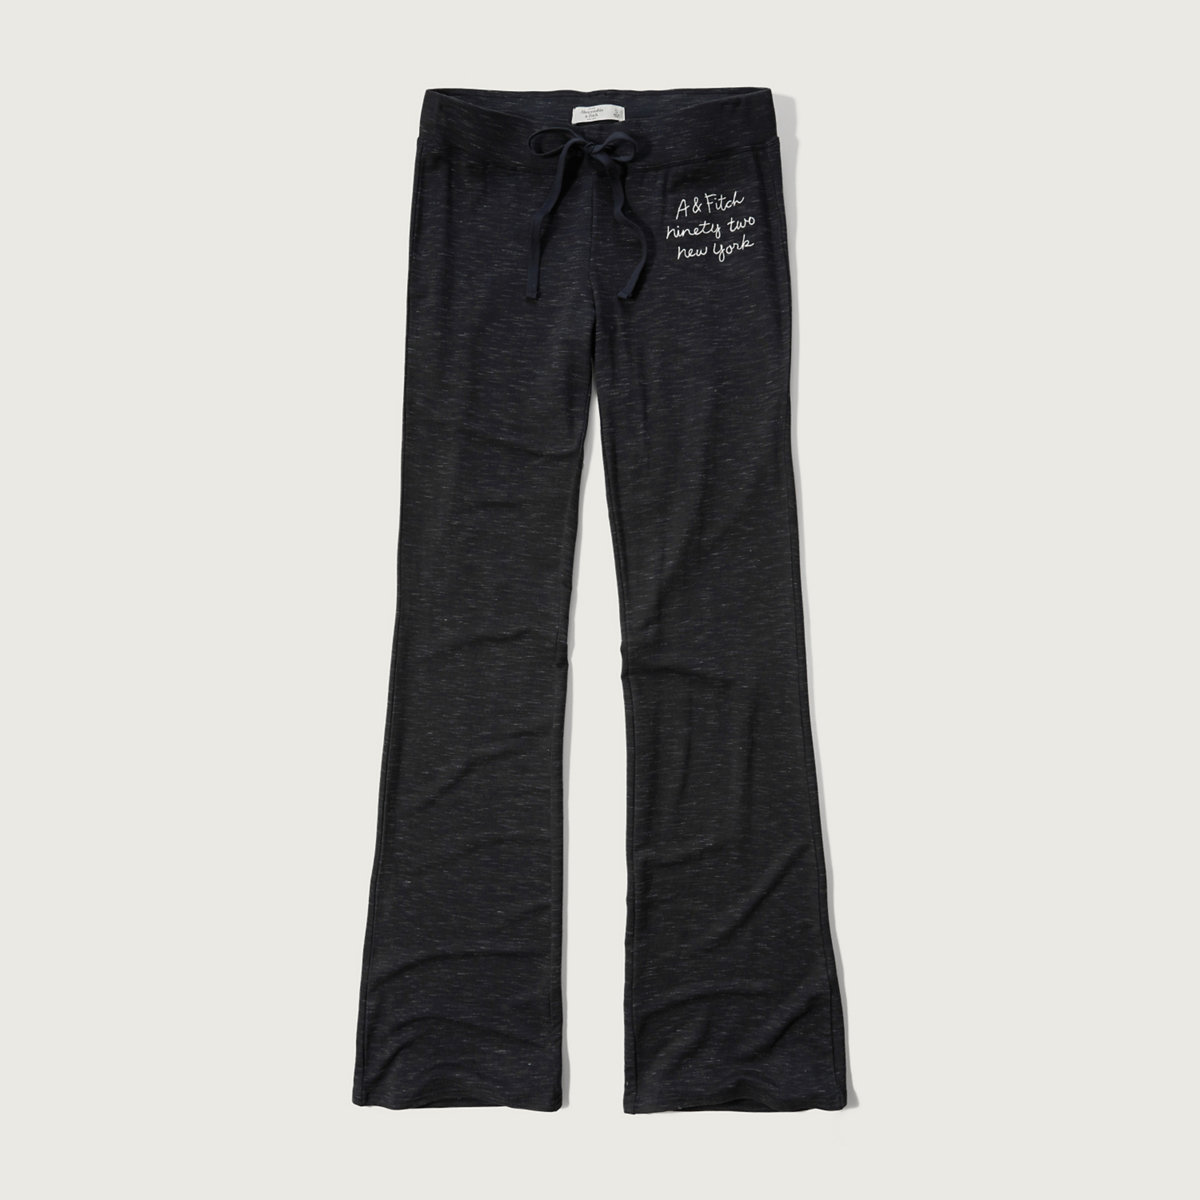 A&F Flare Graphic Sweatpants